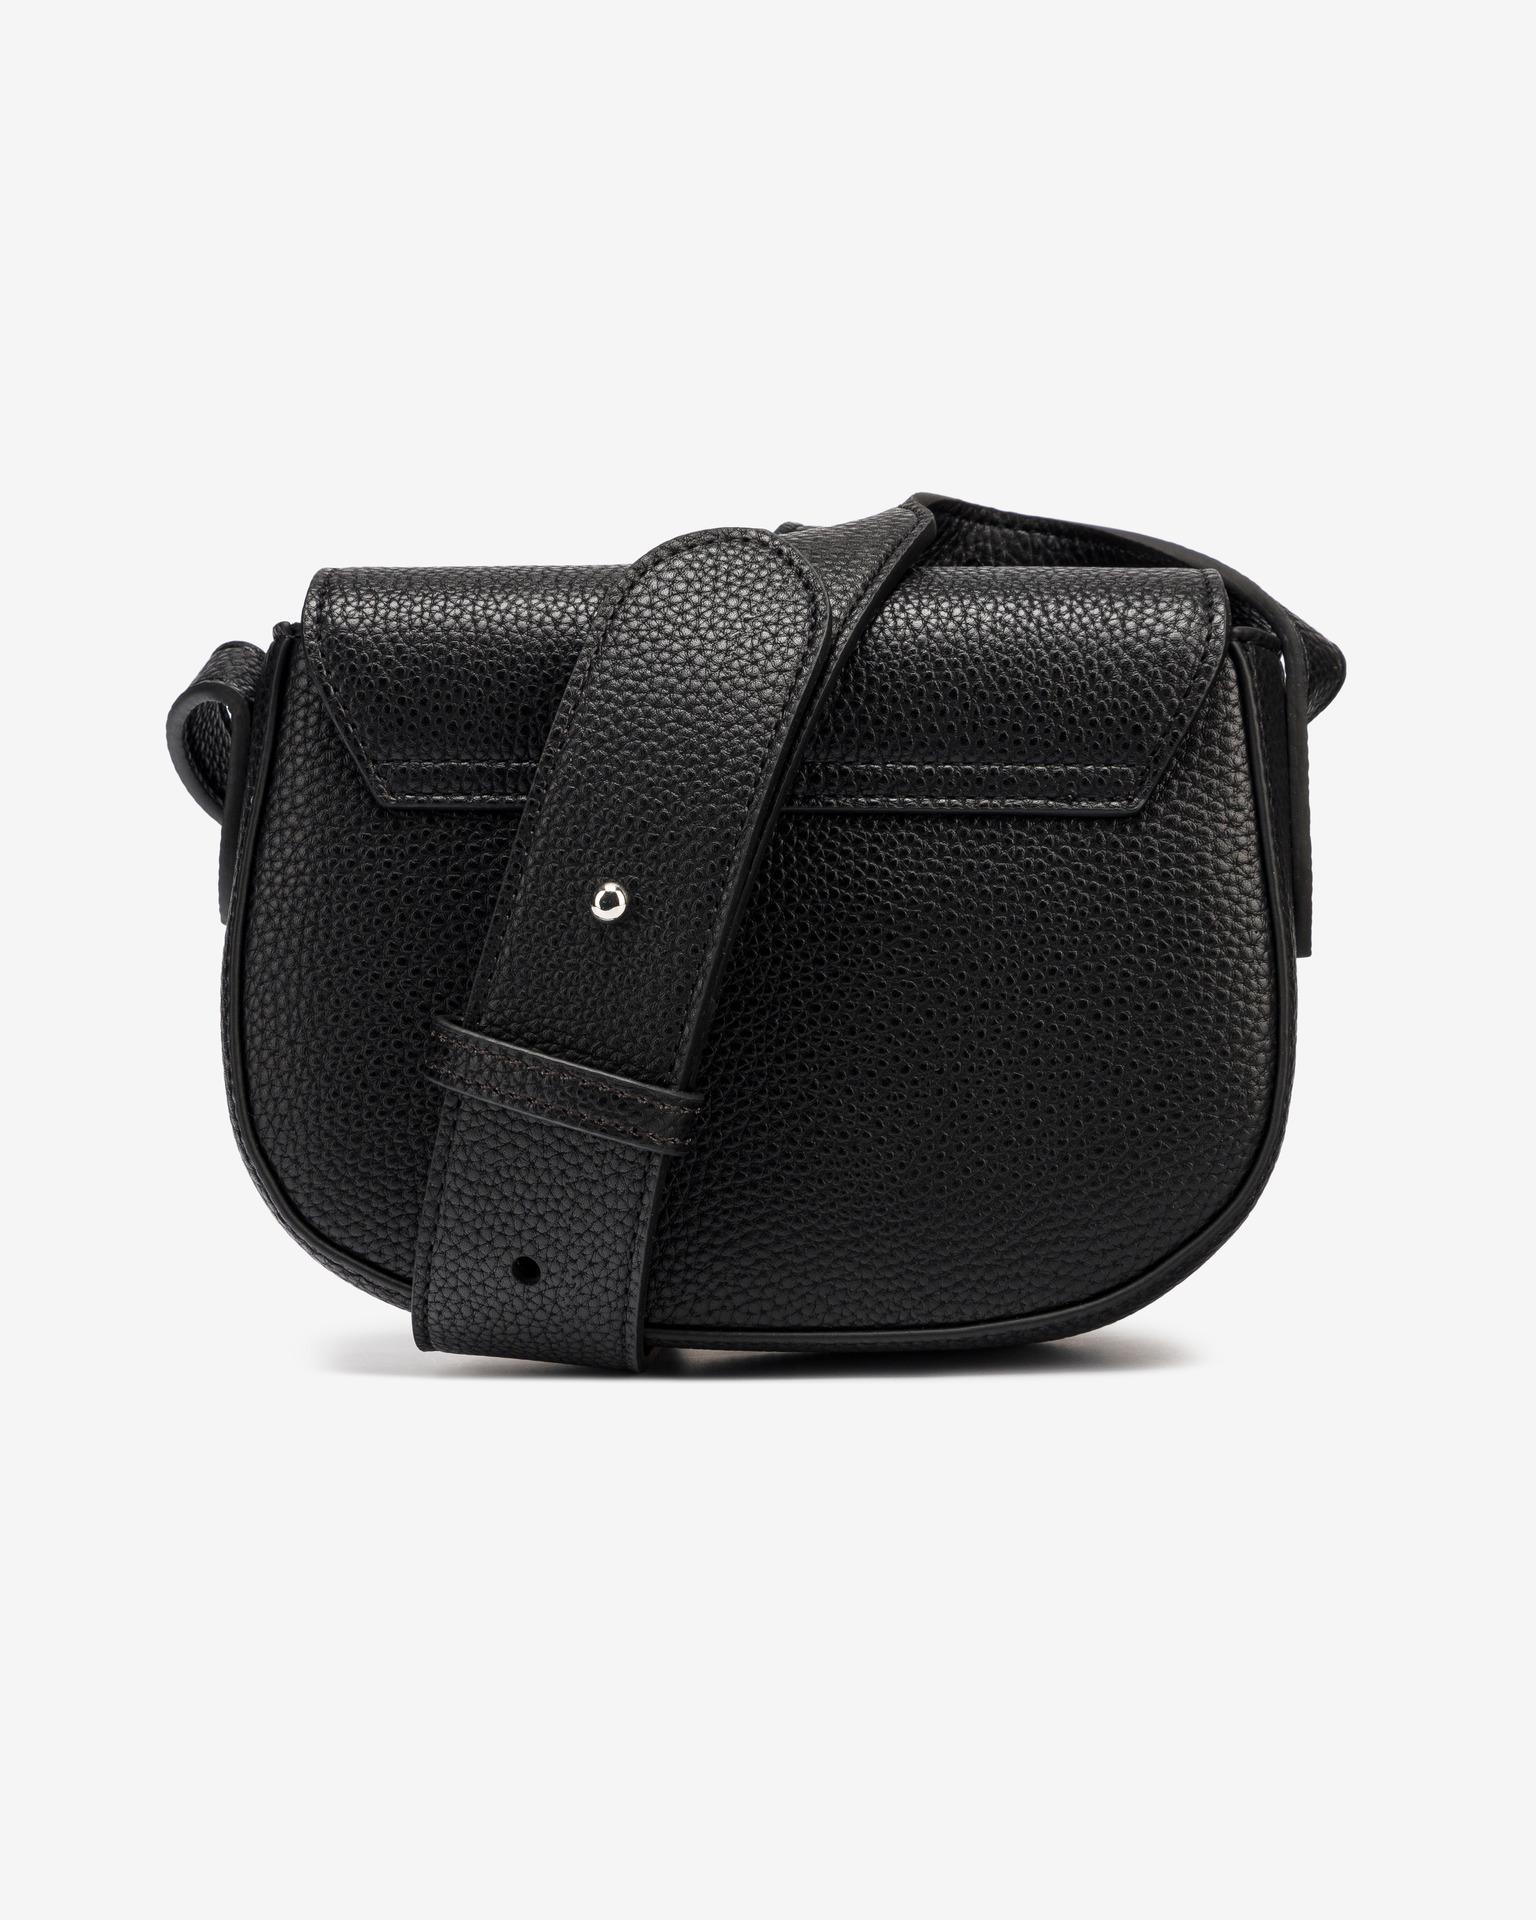 Armani Exchange black handbag